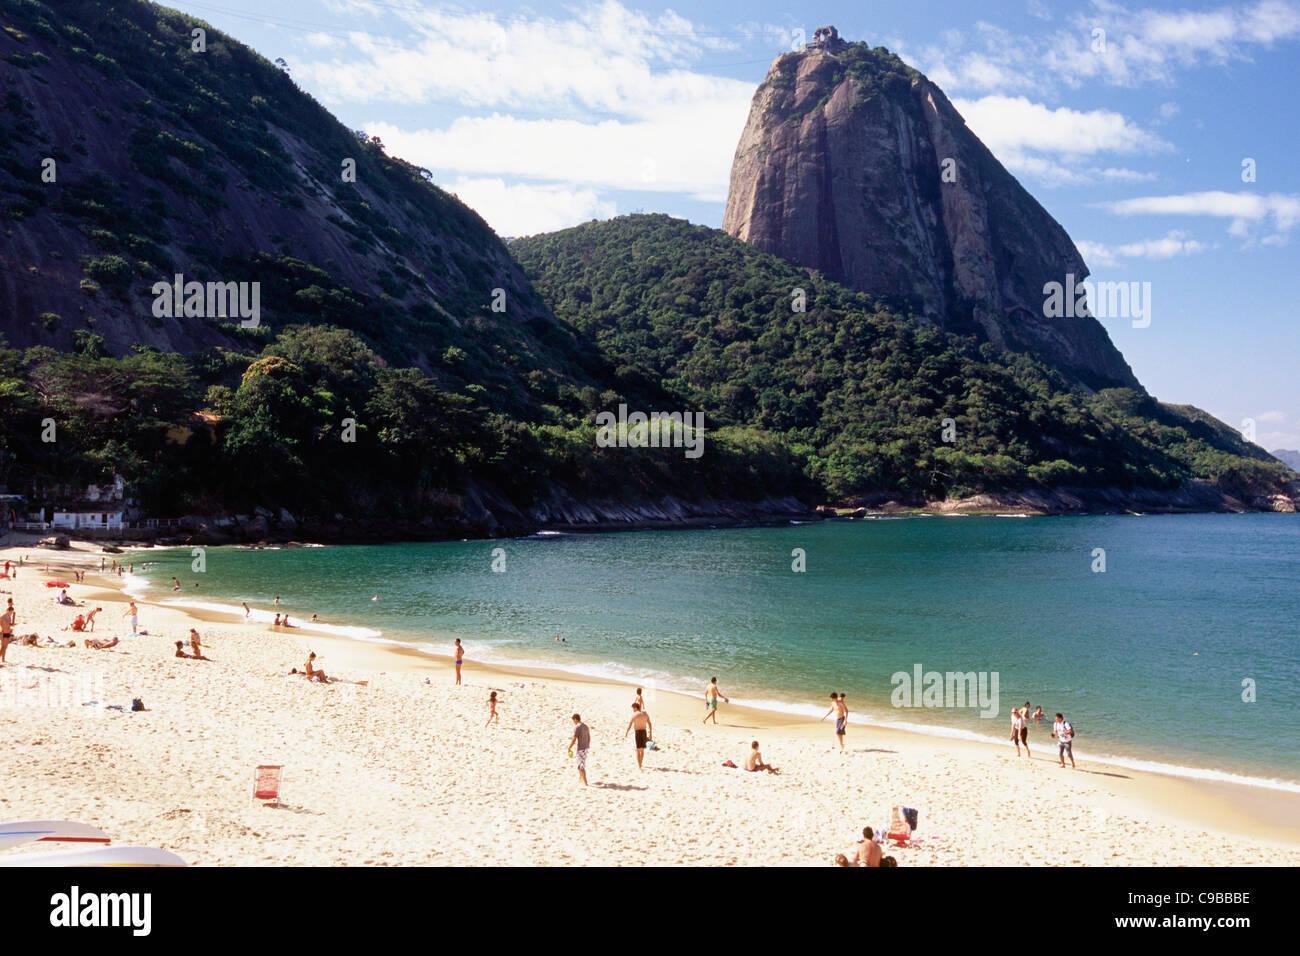 View of the Sugarloaf Mountain from the Vermelha Beach, Rio de Janeiro, Brazil - Stock Image